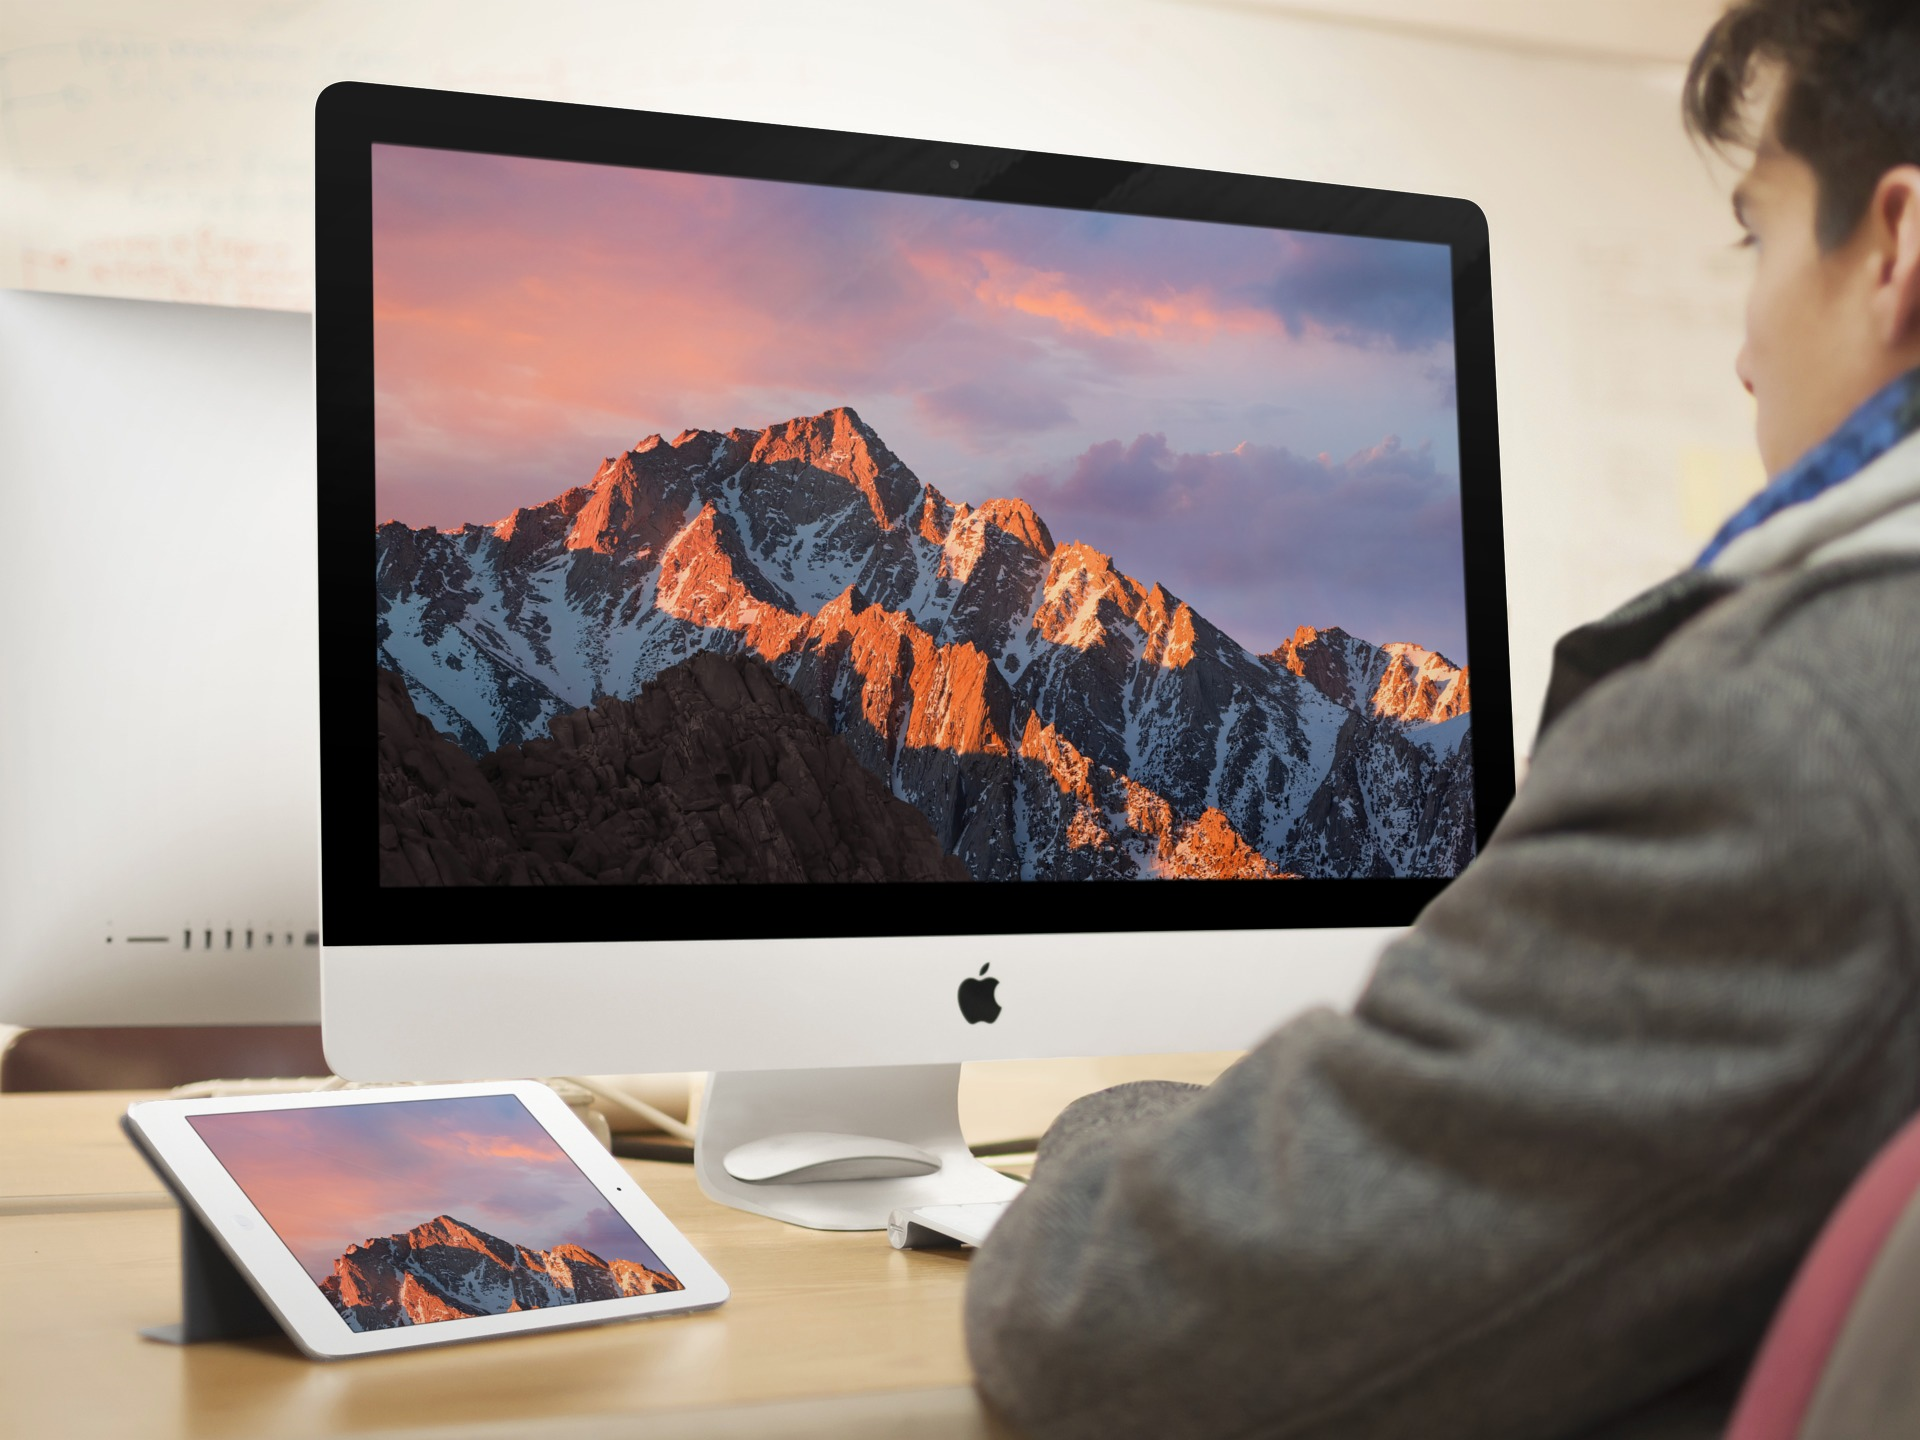 Hacker Wallpaper Hd 1366x768 Download Macos Sierra And Ios 10 Wallpaper High Res